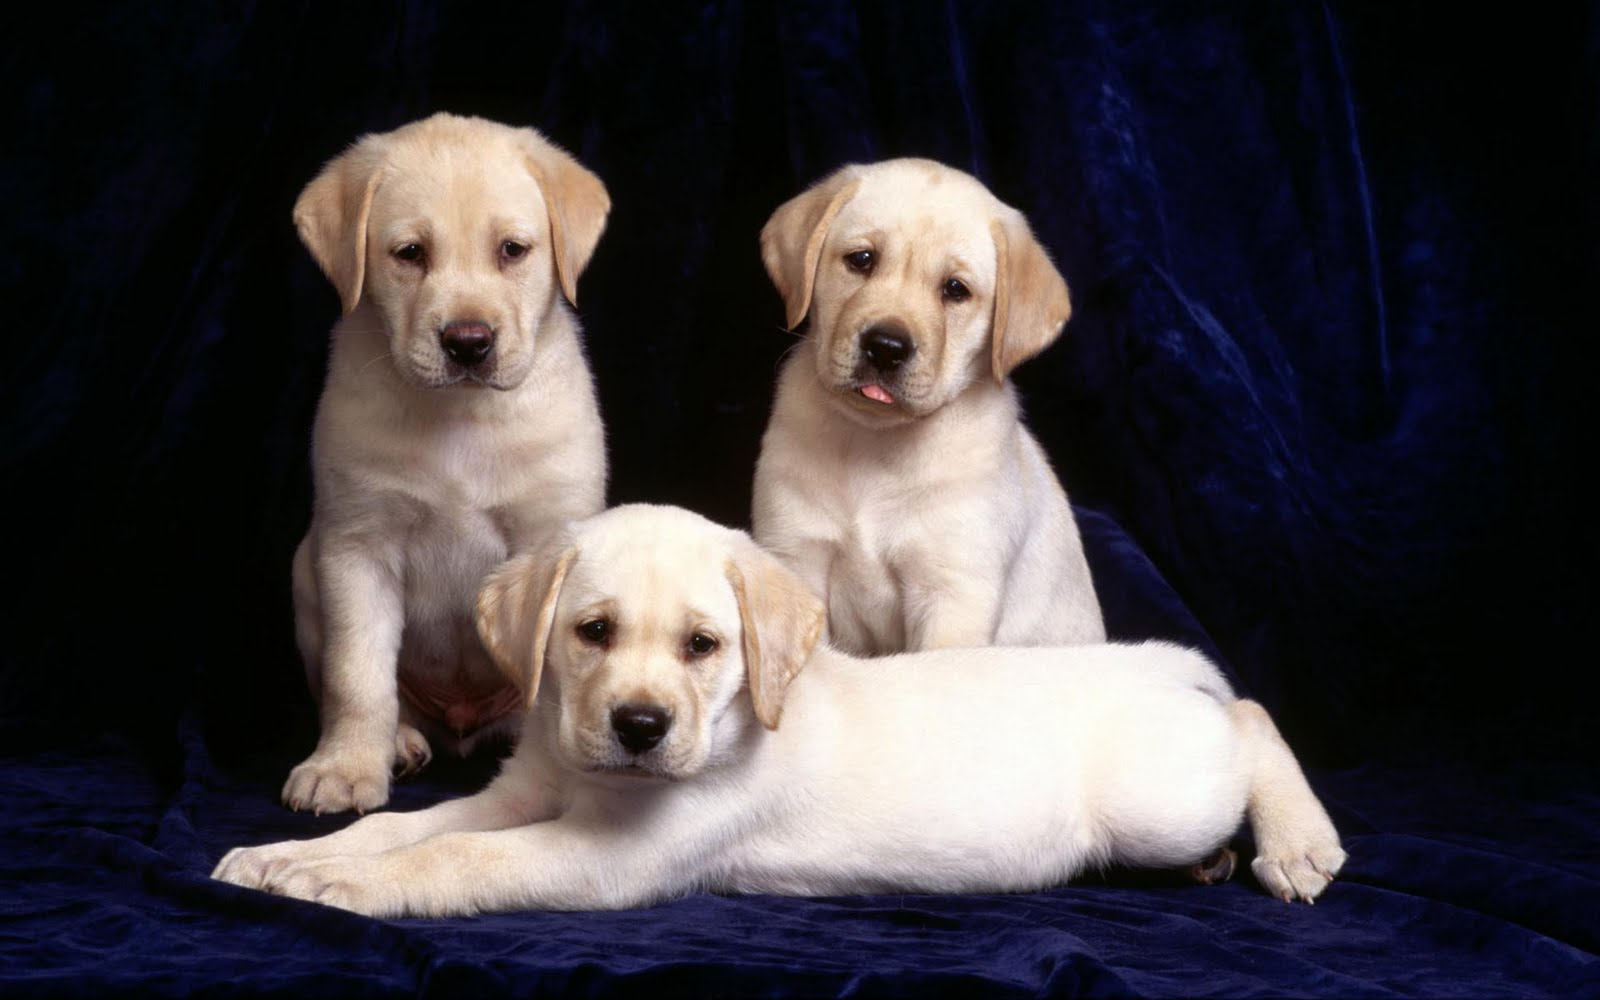 Labrador Dog HD Wallpaper O ll y WooD Wallpapers 1600x1000